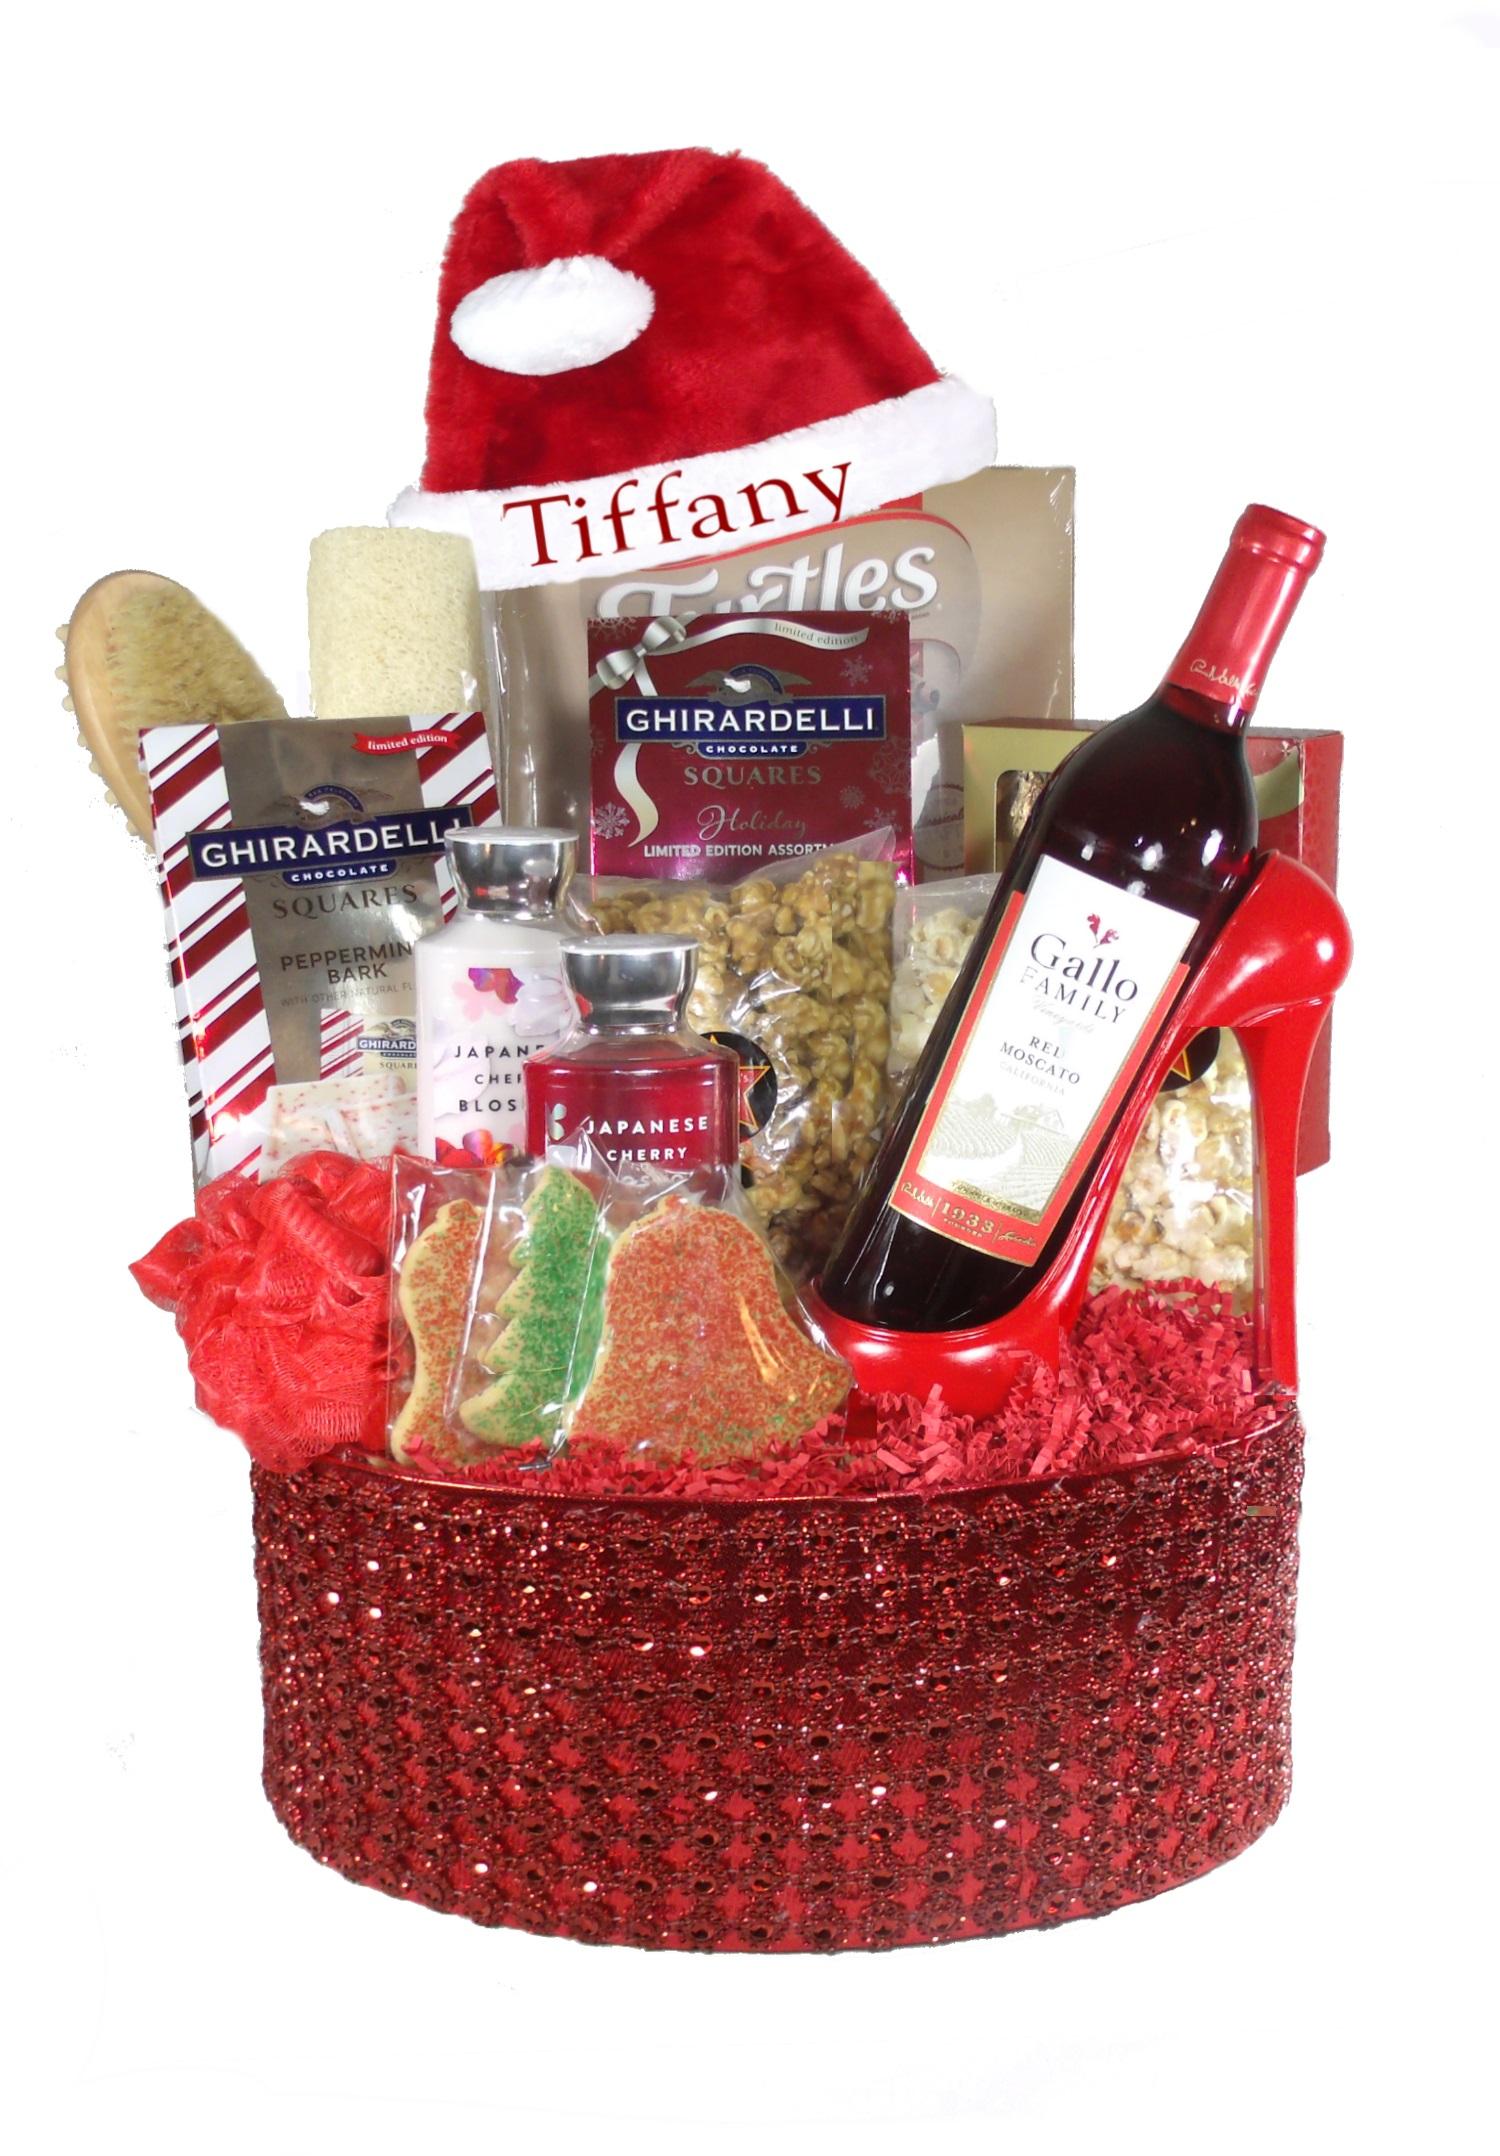 Ghirardelli Christmas Gift Baskets | Lamoureph Blog